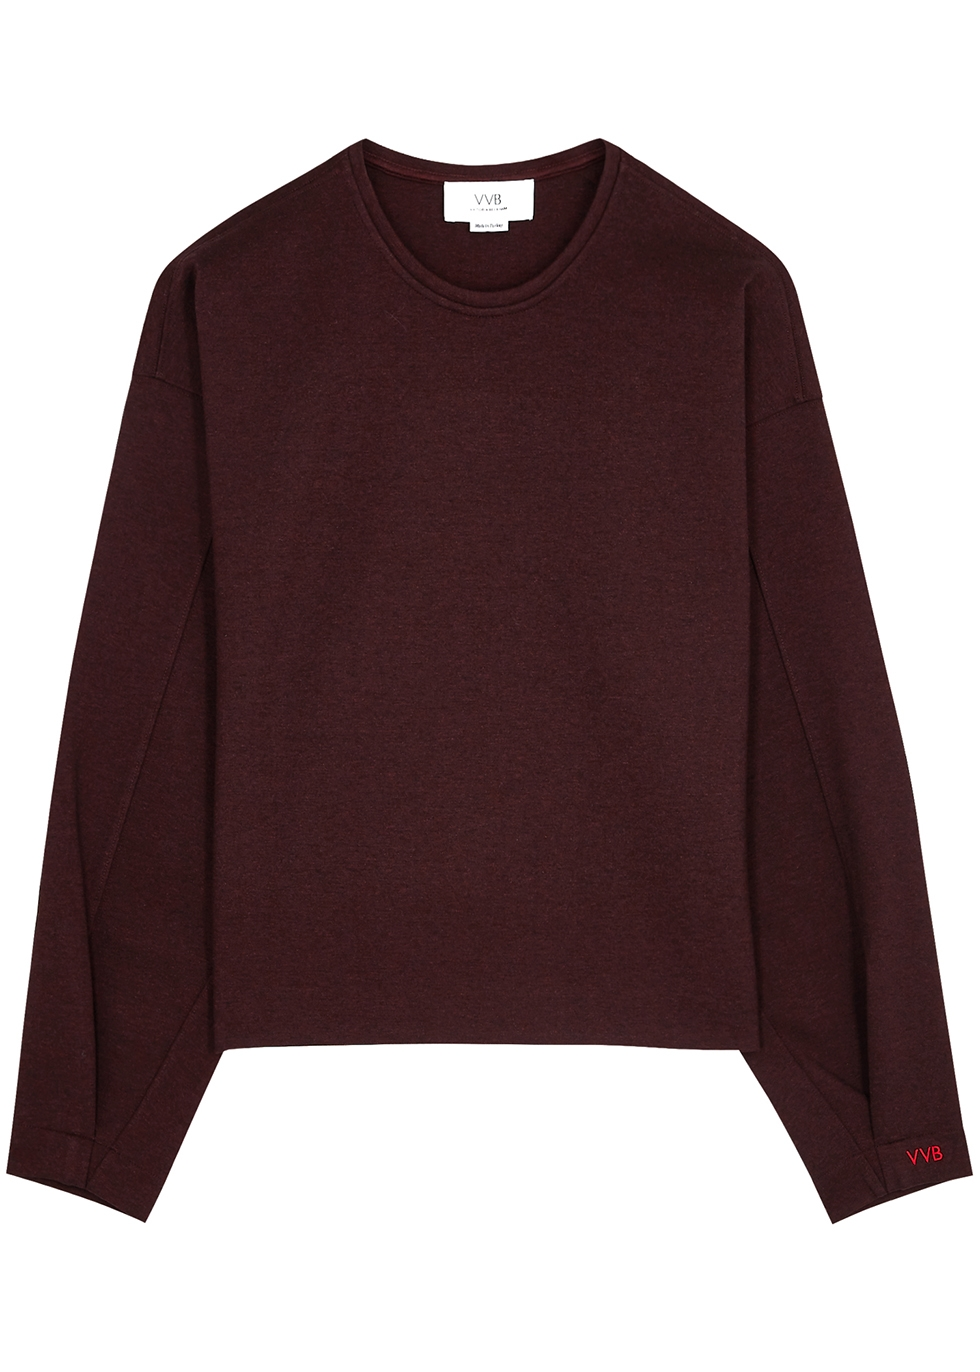 Burgundy jersey sweatshirt